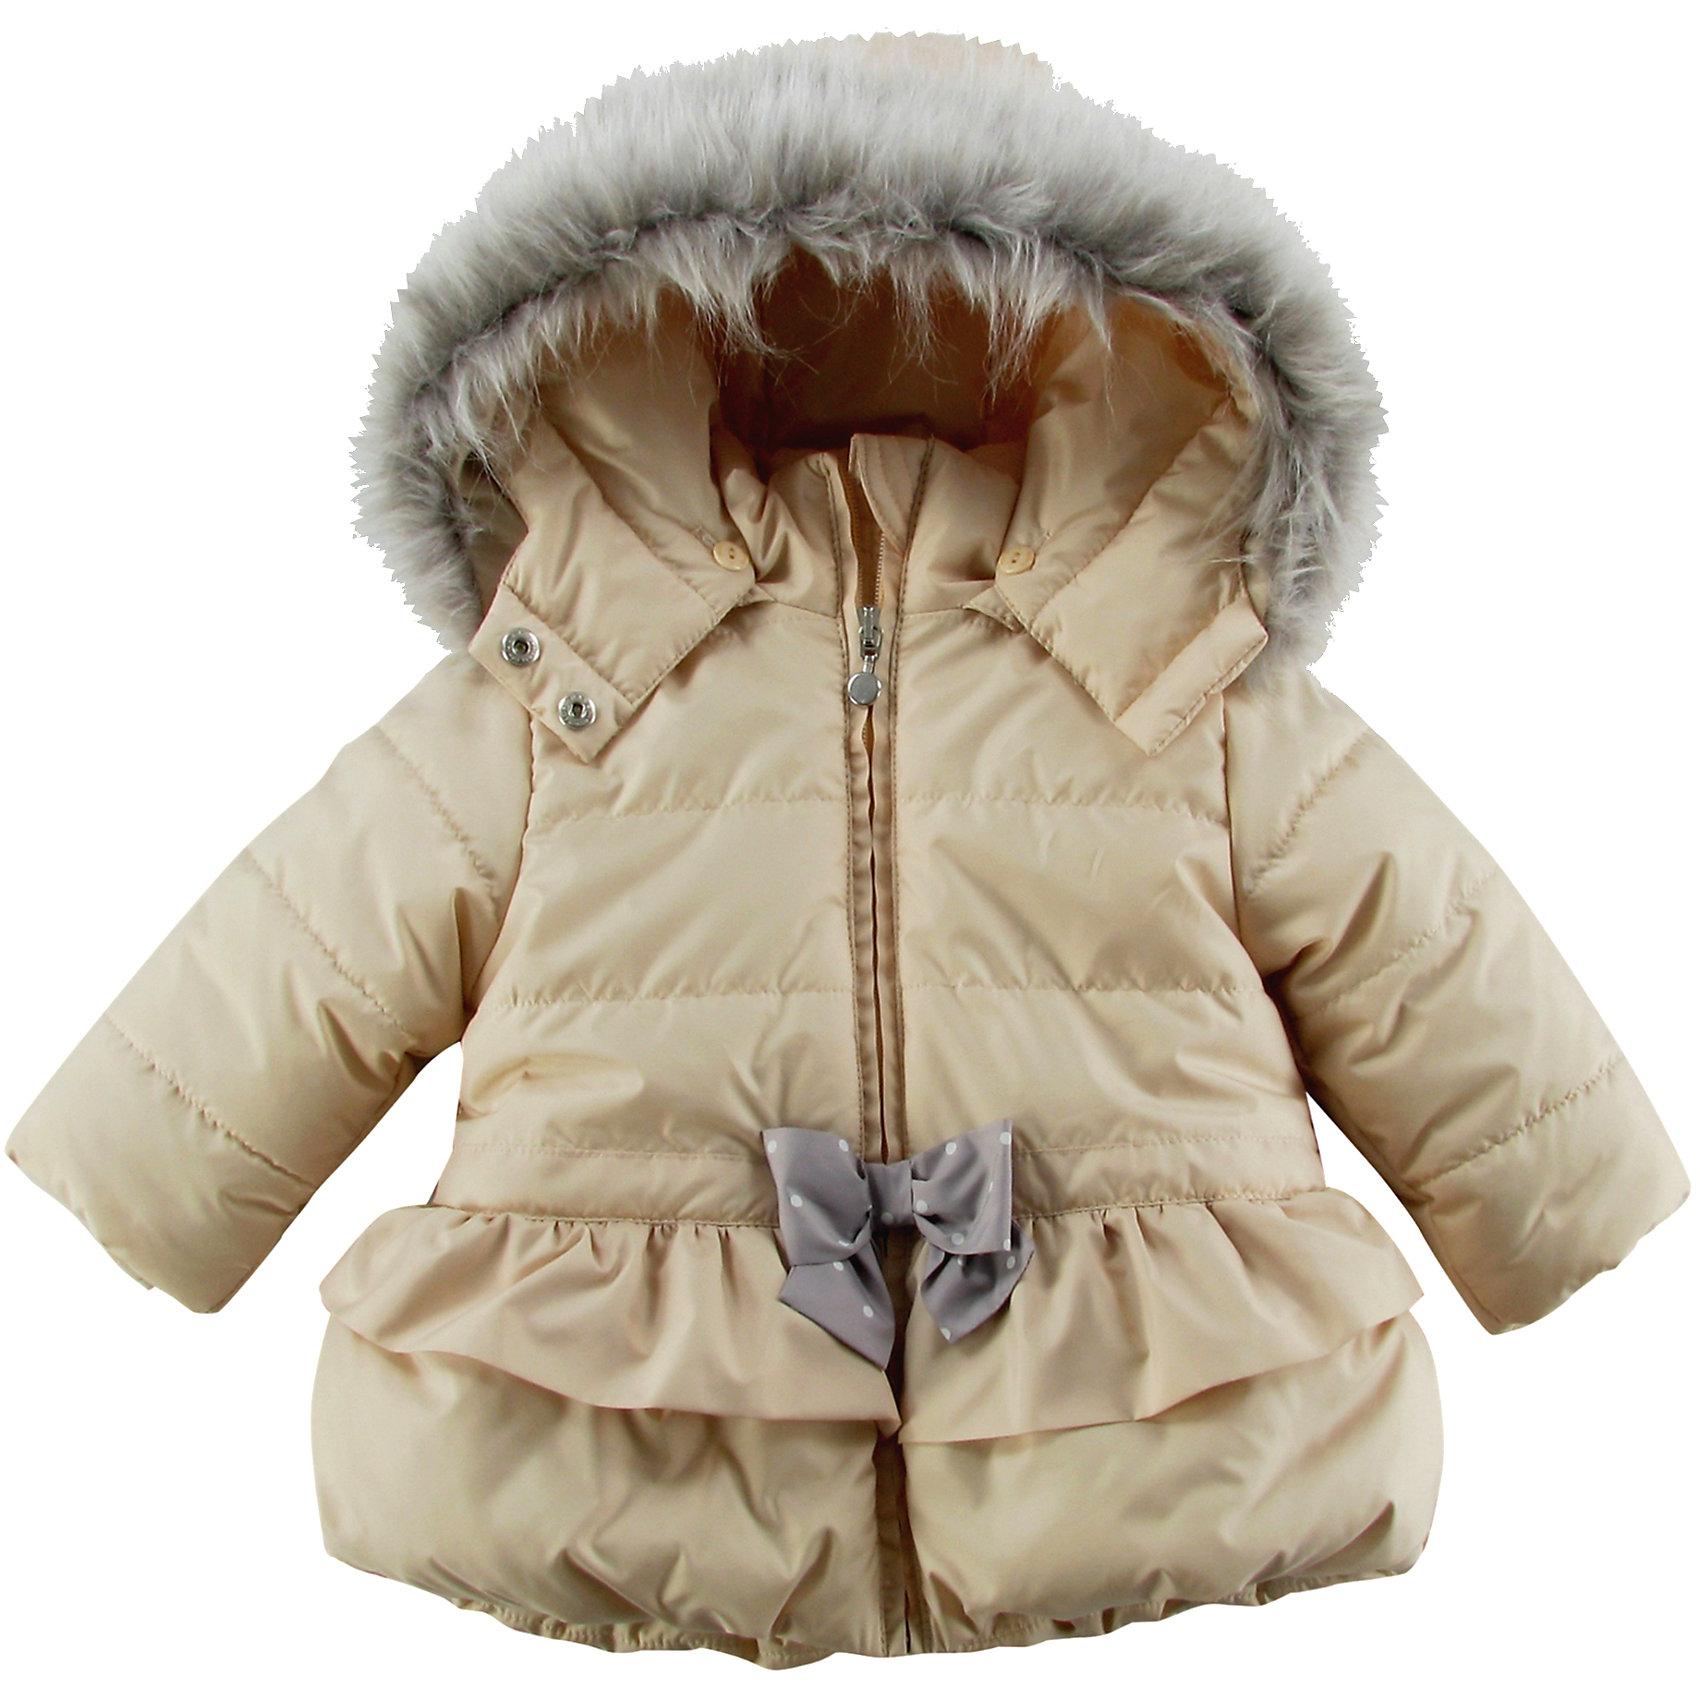 Куртка утепленная для девочки WojcikВерхняя одежда<br>Куртка утепленная для девочки Wojcik<br>Состав:<br>Полиэстер 100%<br><br>Ширина мм: 356<br>Глубина мм: 10<br>Высота мм: 245<br>Вес г: 519<br>Цвет: бежевый<br>Возраст от месяцев: 24<br>Возраст до месяцев: 36<br>Пол: Женский<br>Возраст: Детский<br>Размер: 98,74,80,86,92<br>SKU: 5590885